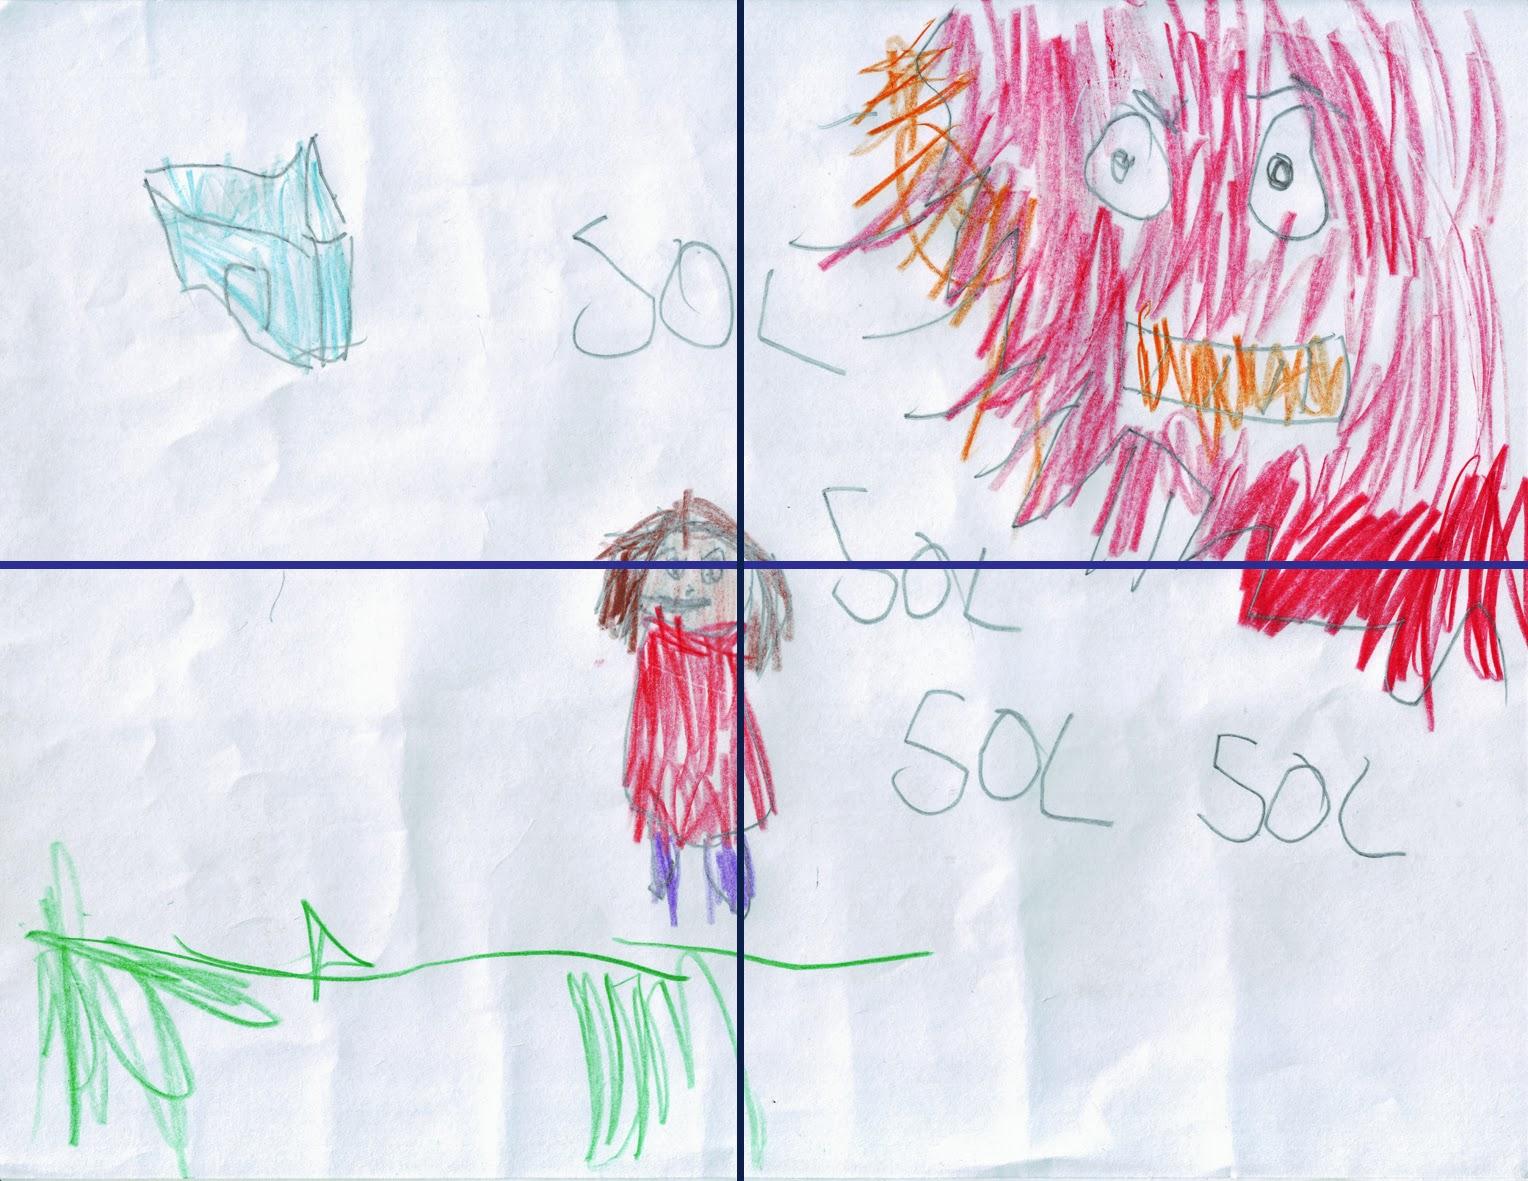 muestra-nina-maltratada-5-anos-3-meses-cuadricula